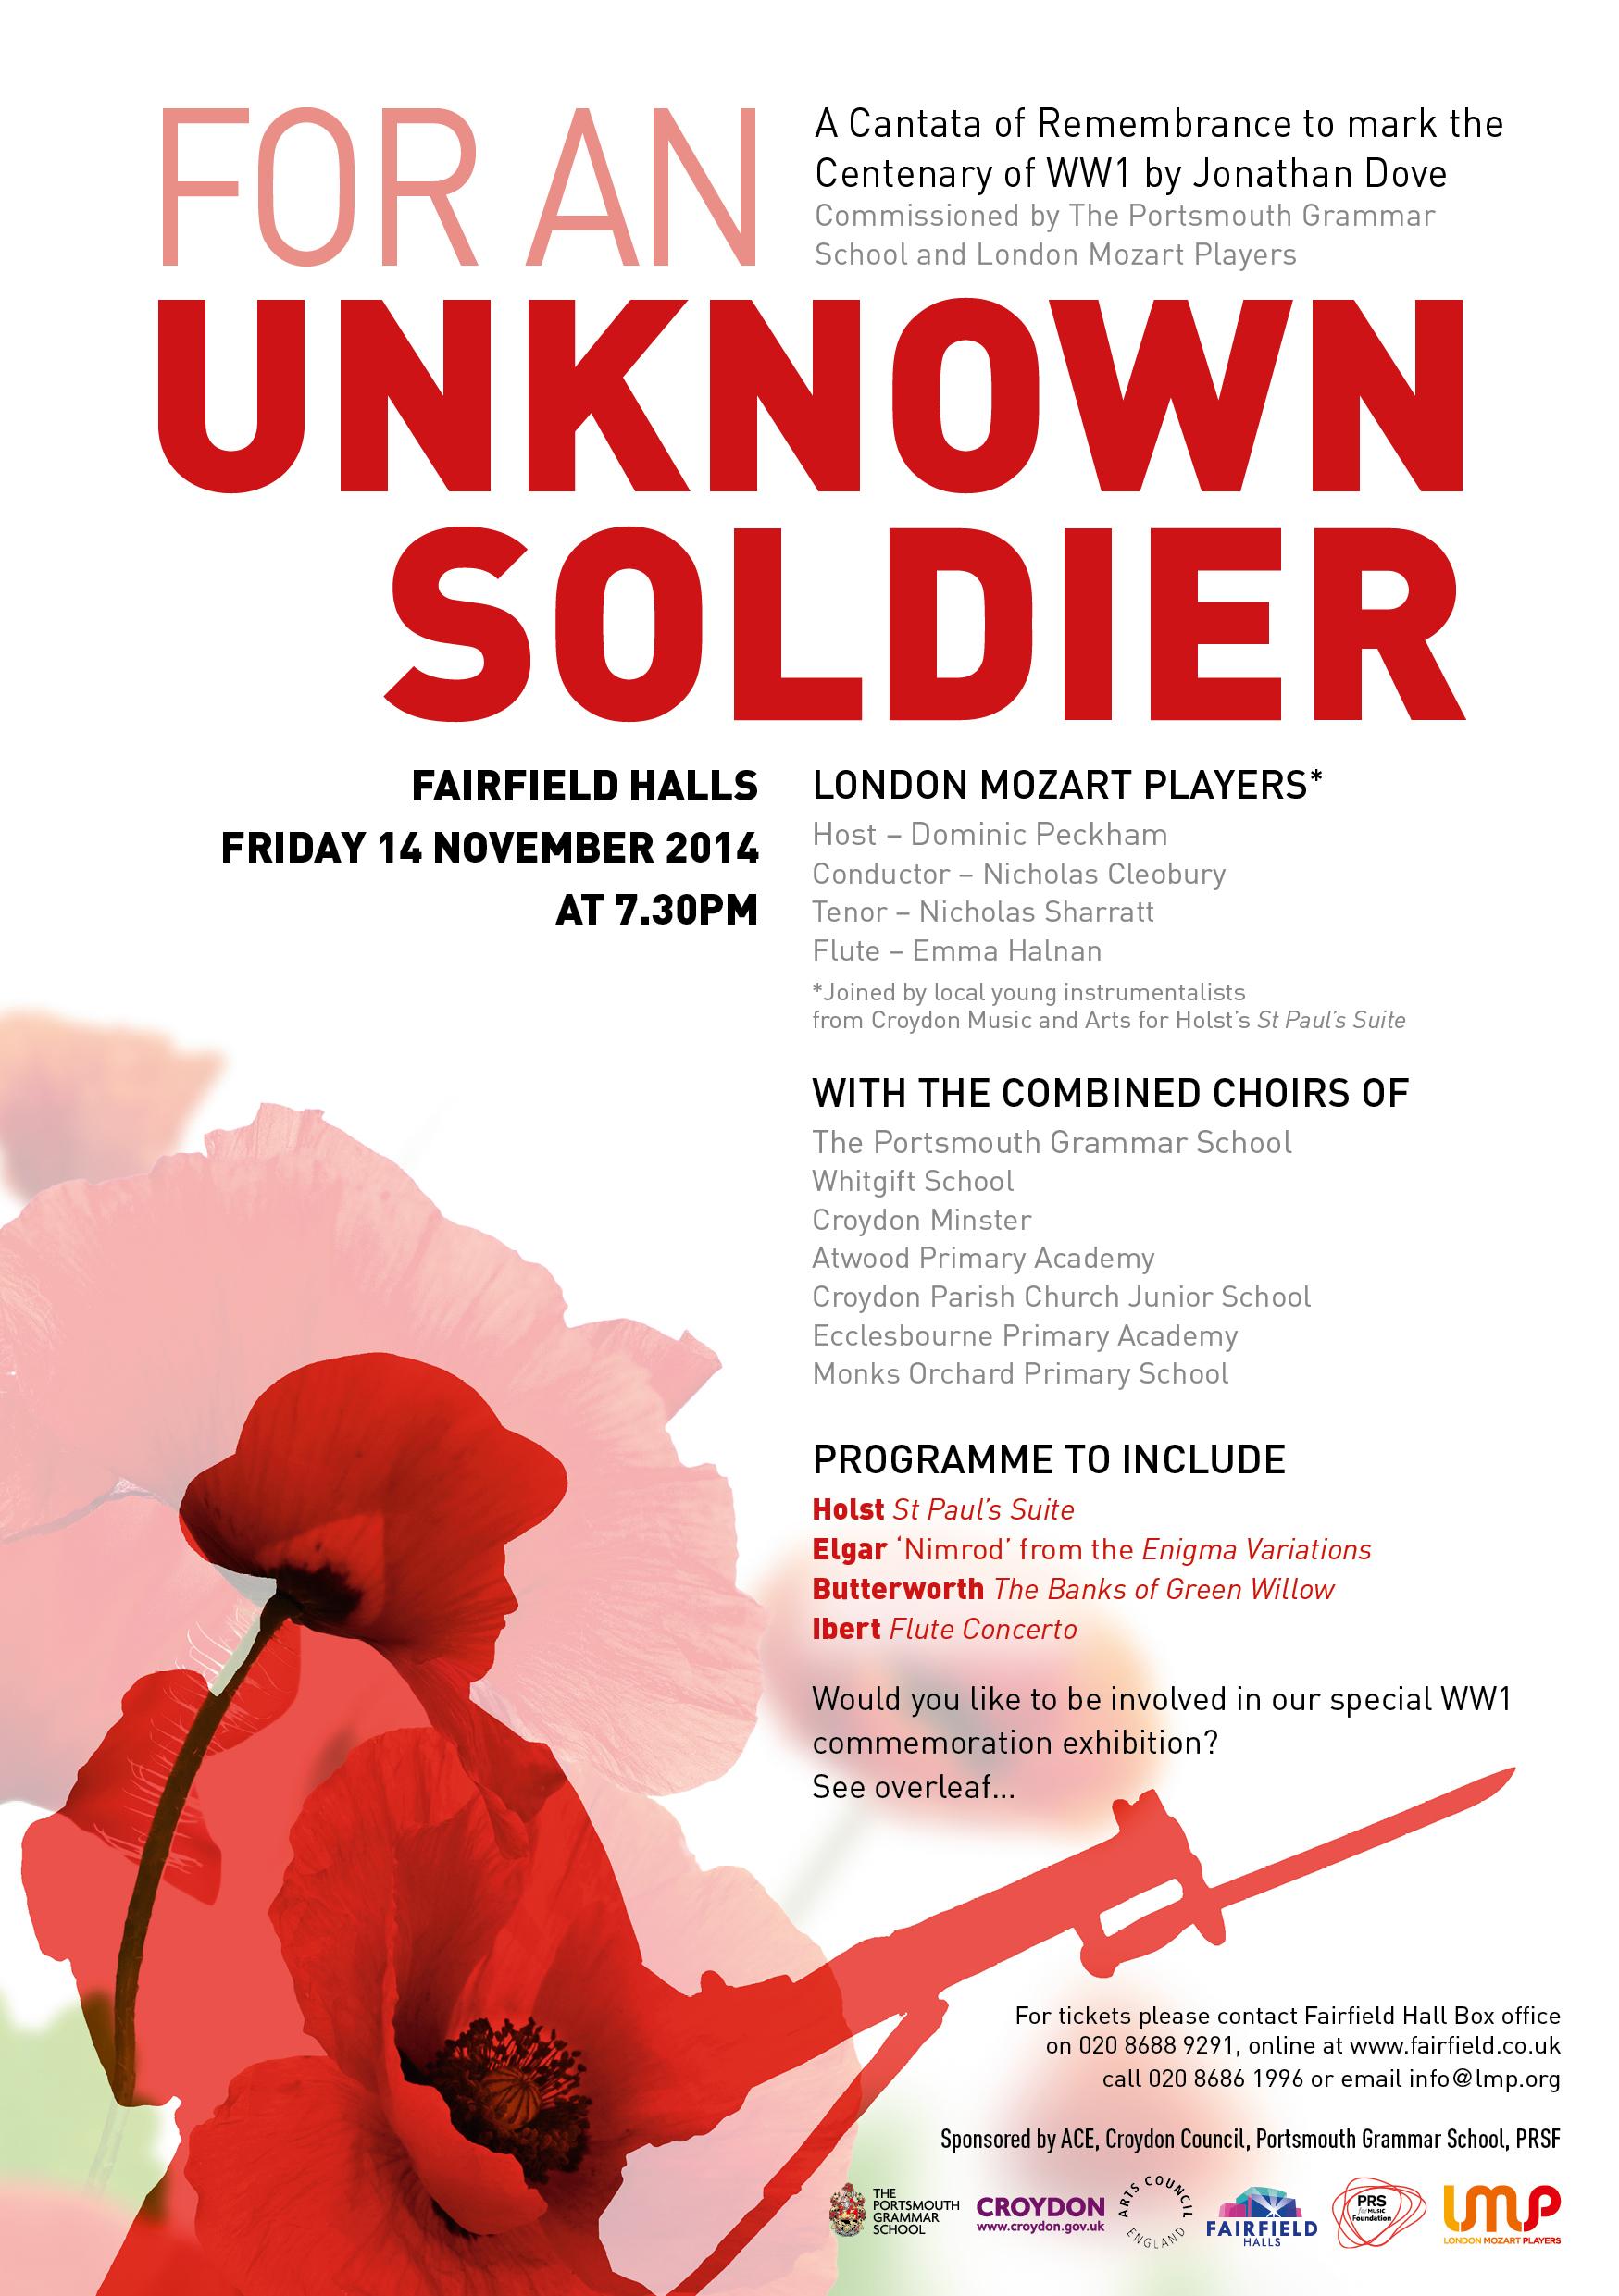 Friday, 14 November 2014